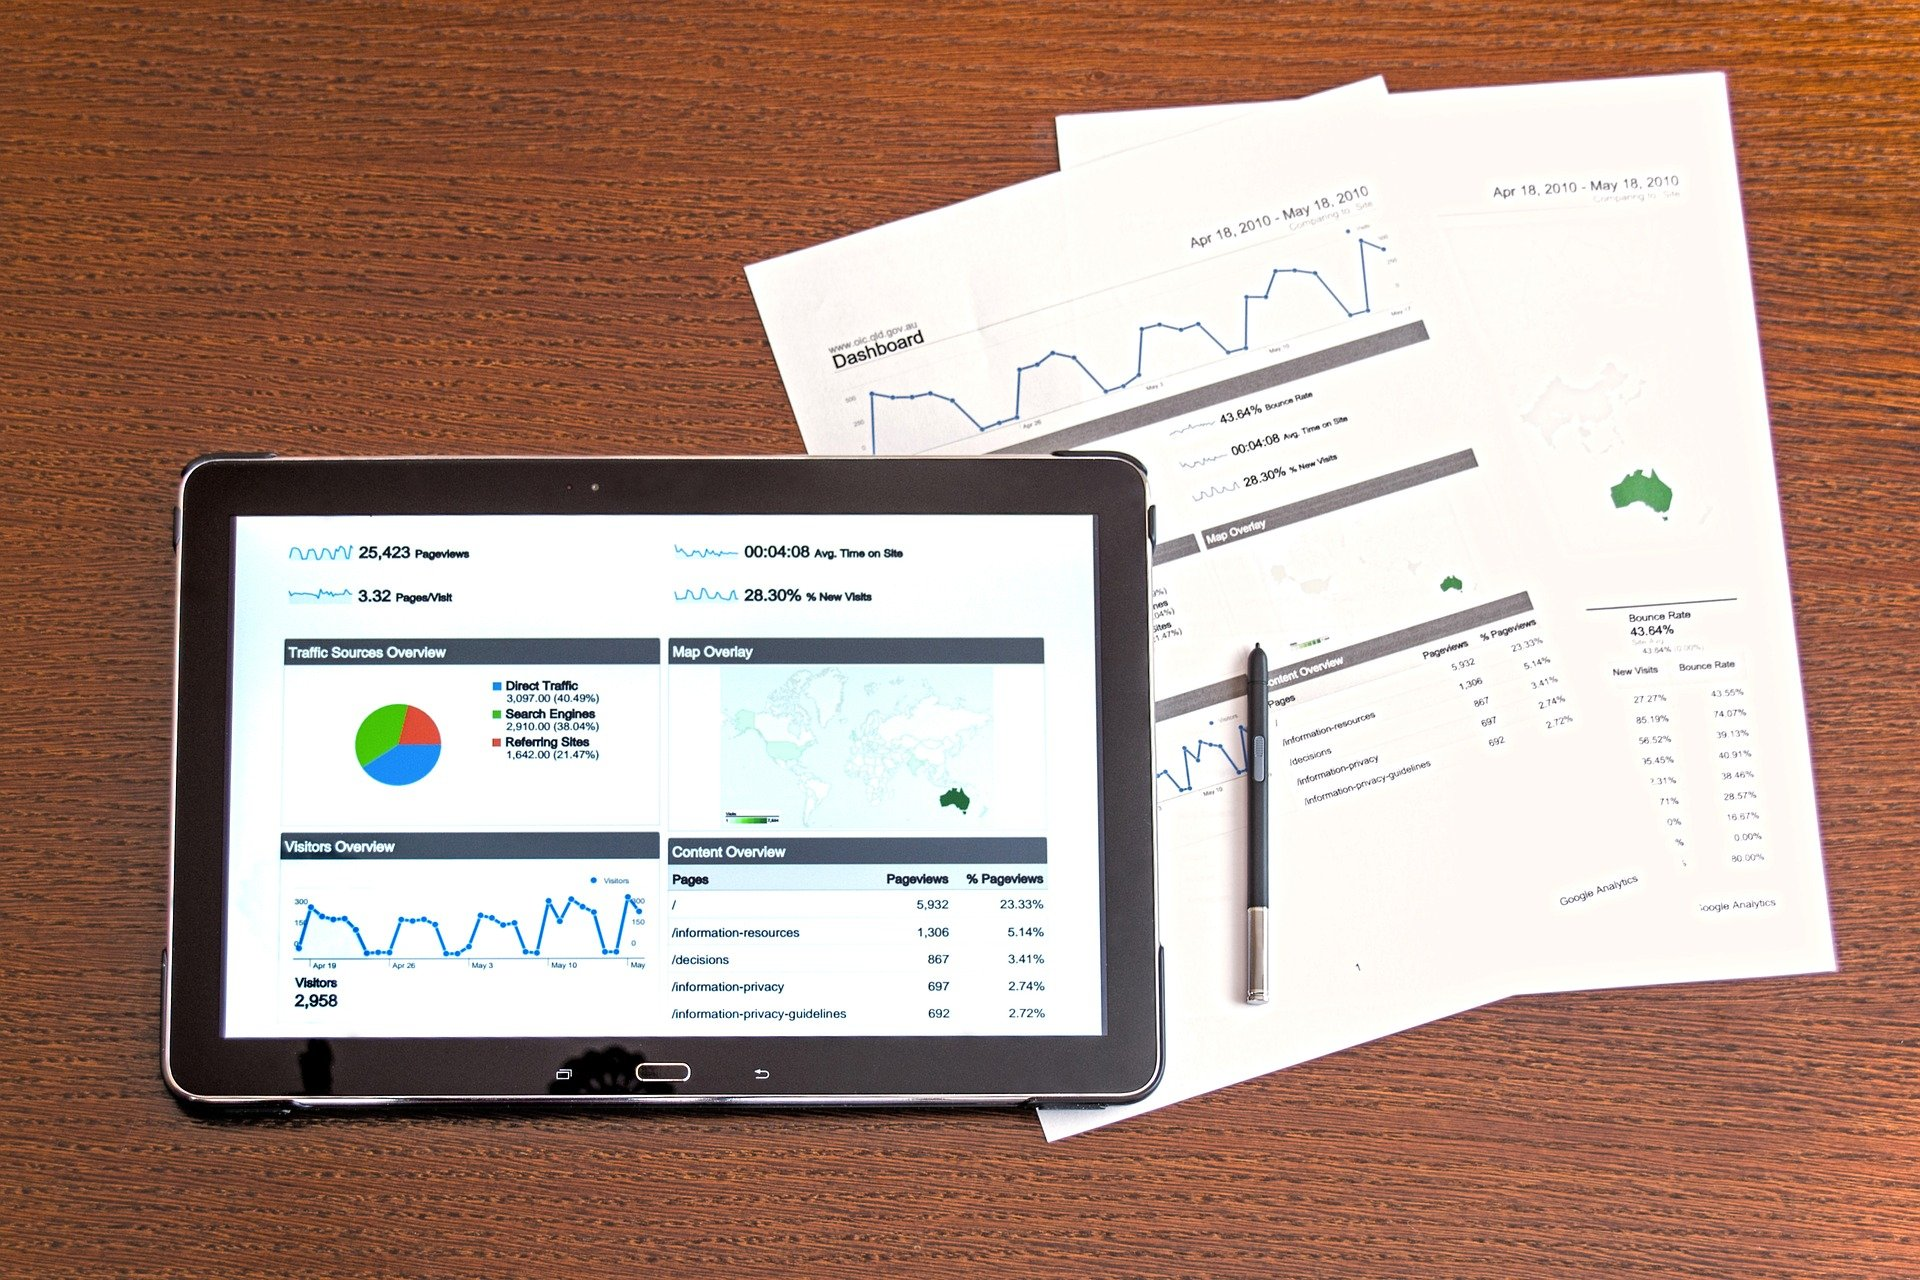 Application Monitoring - dashboard